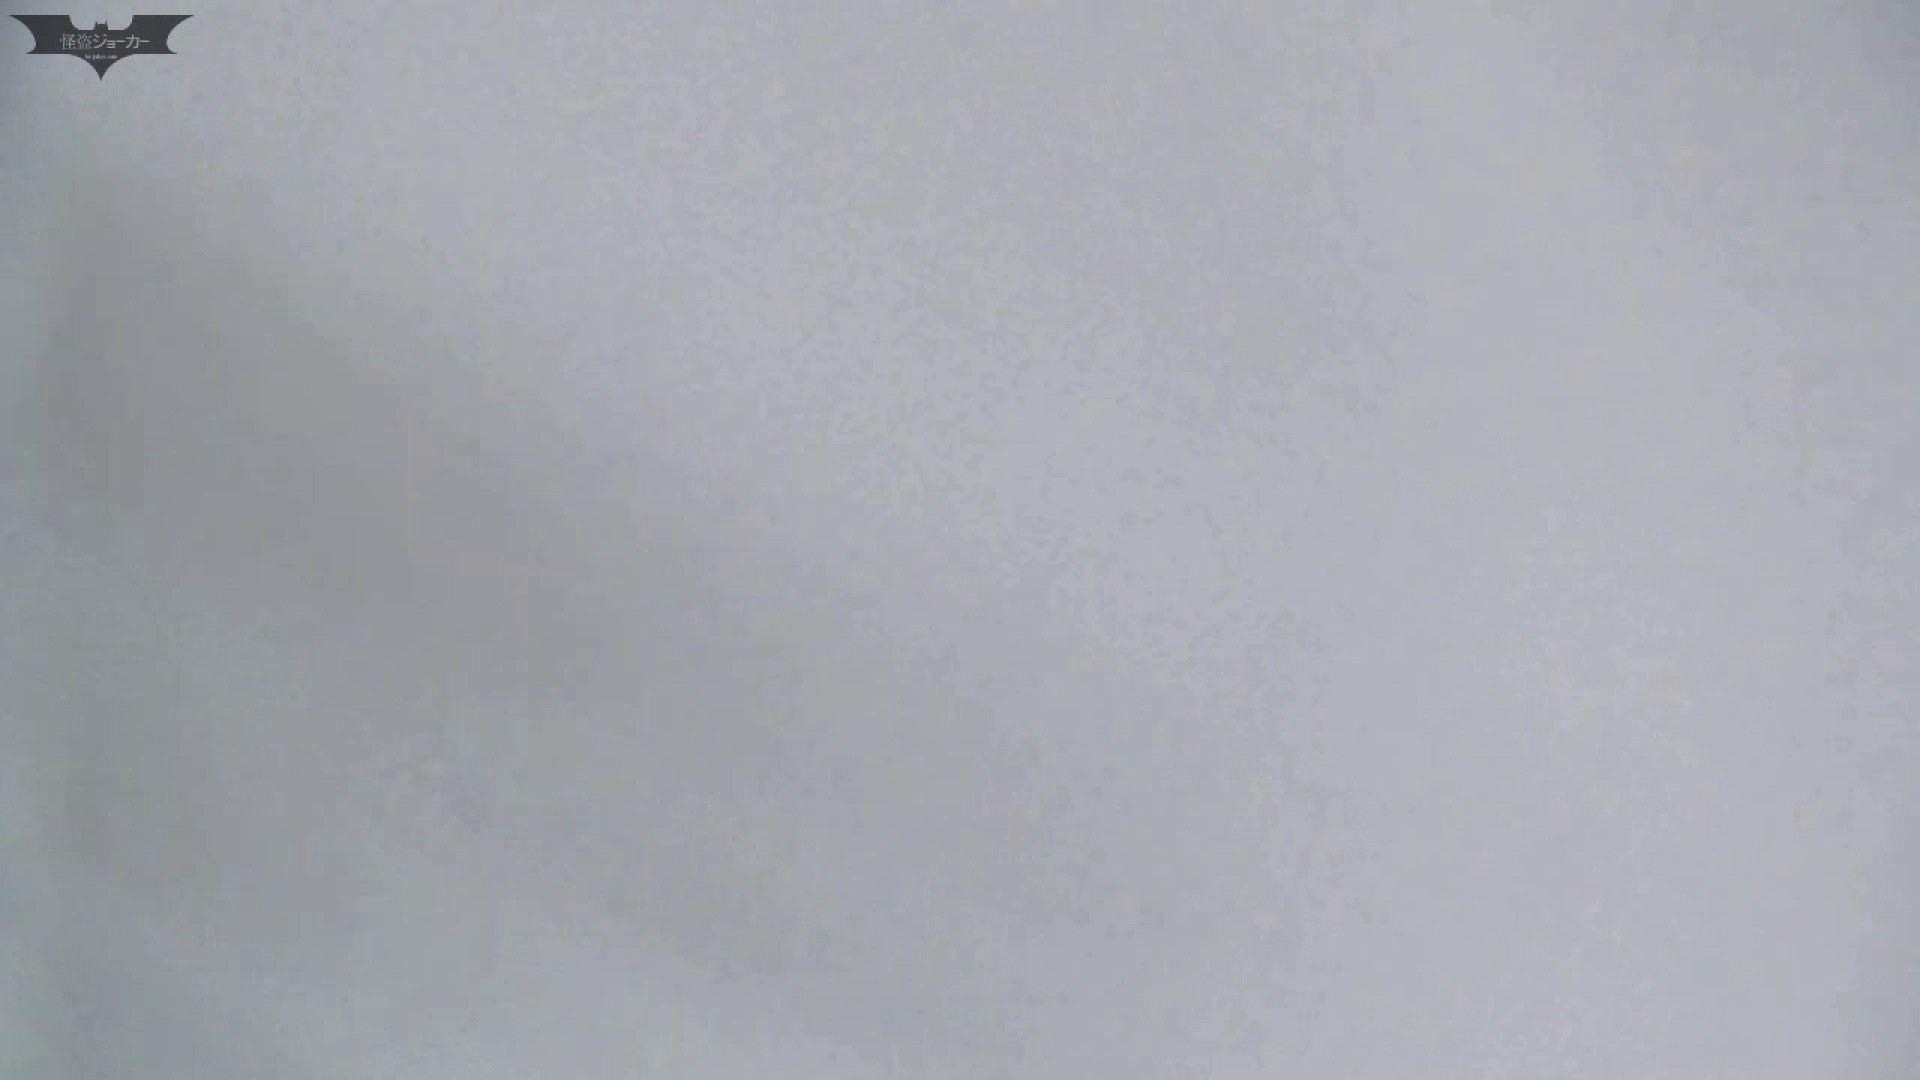 【期間・個数限定配信】 マンコ丸見え!第三体育館潜入撮File001 潜入 盗撮戯れ無修正画像 94連発 7